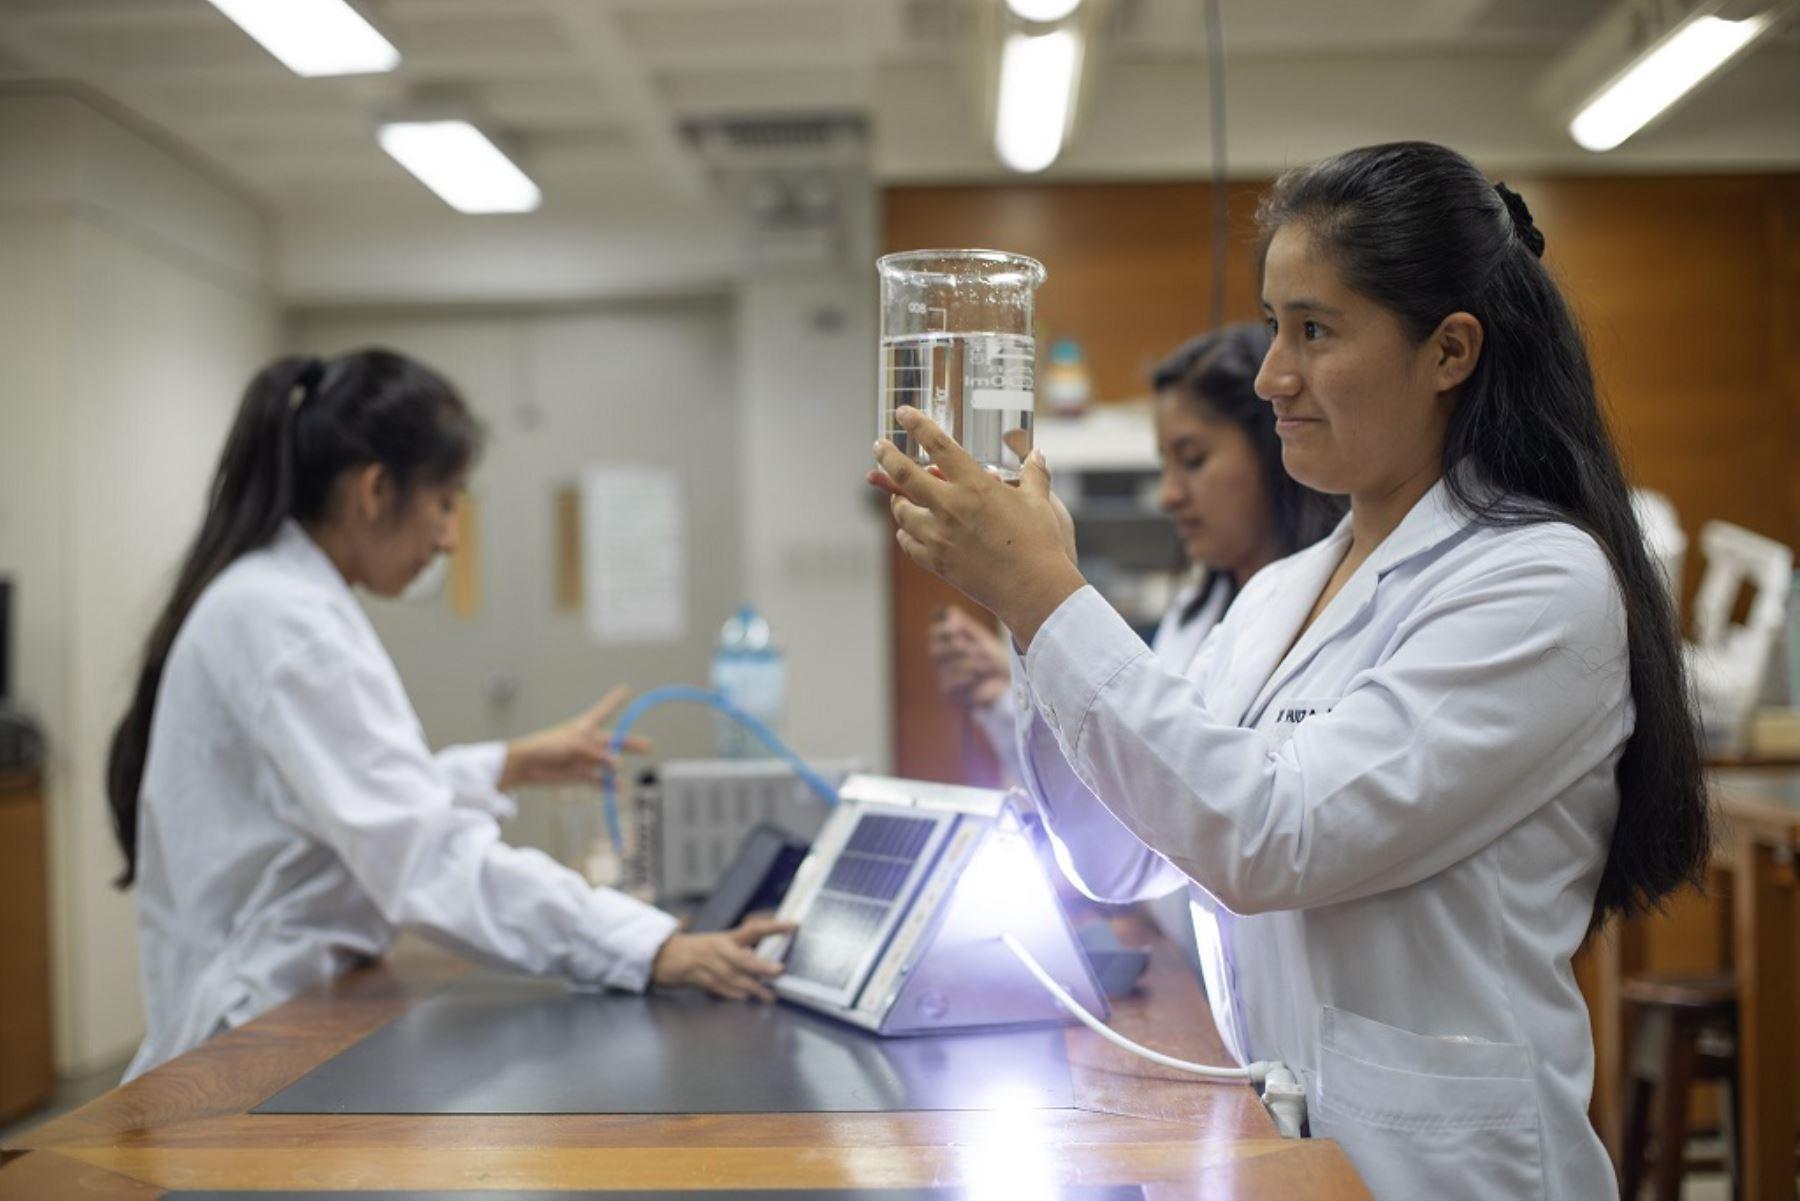 Escolares talentosas podrán postular a 150 becas para carreras de ciencias. Foto: ANDINA/Difusión.